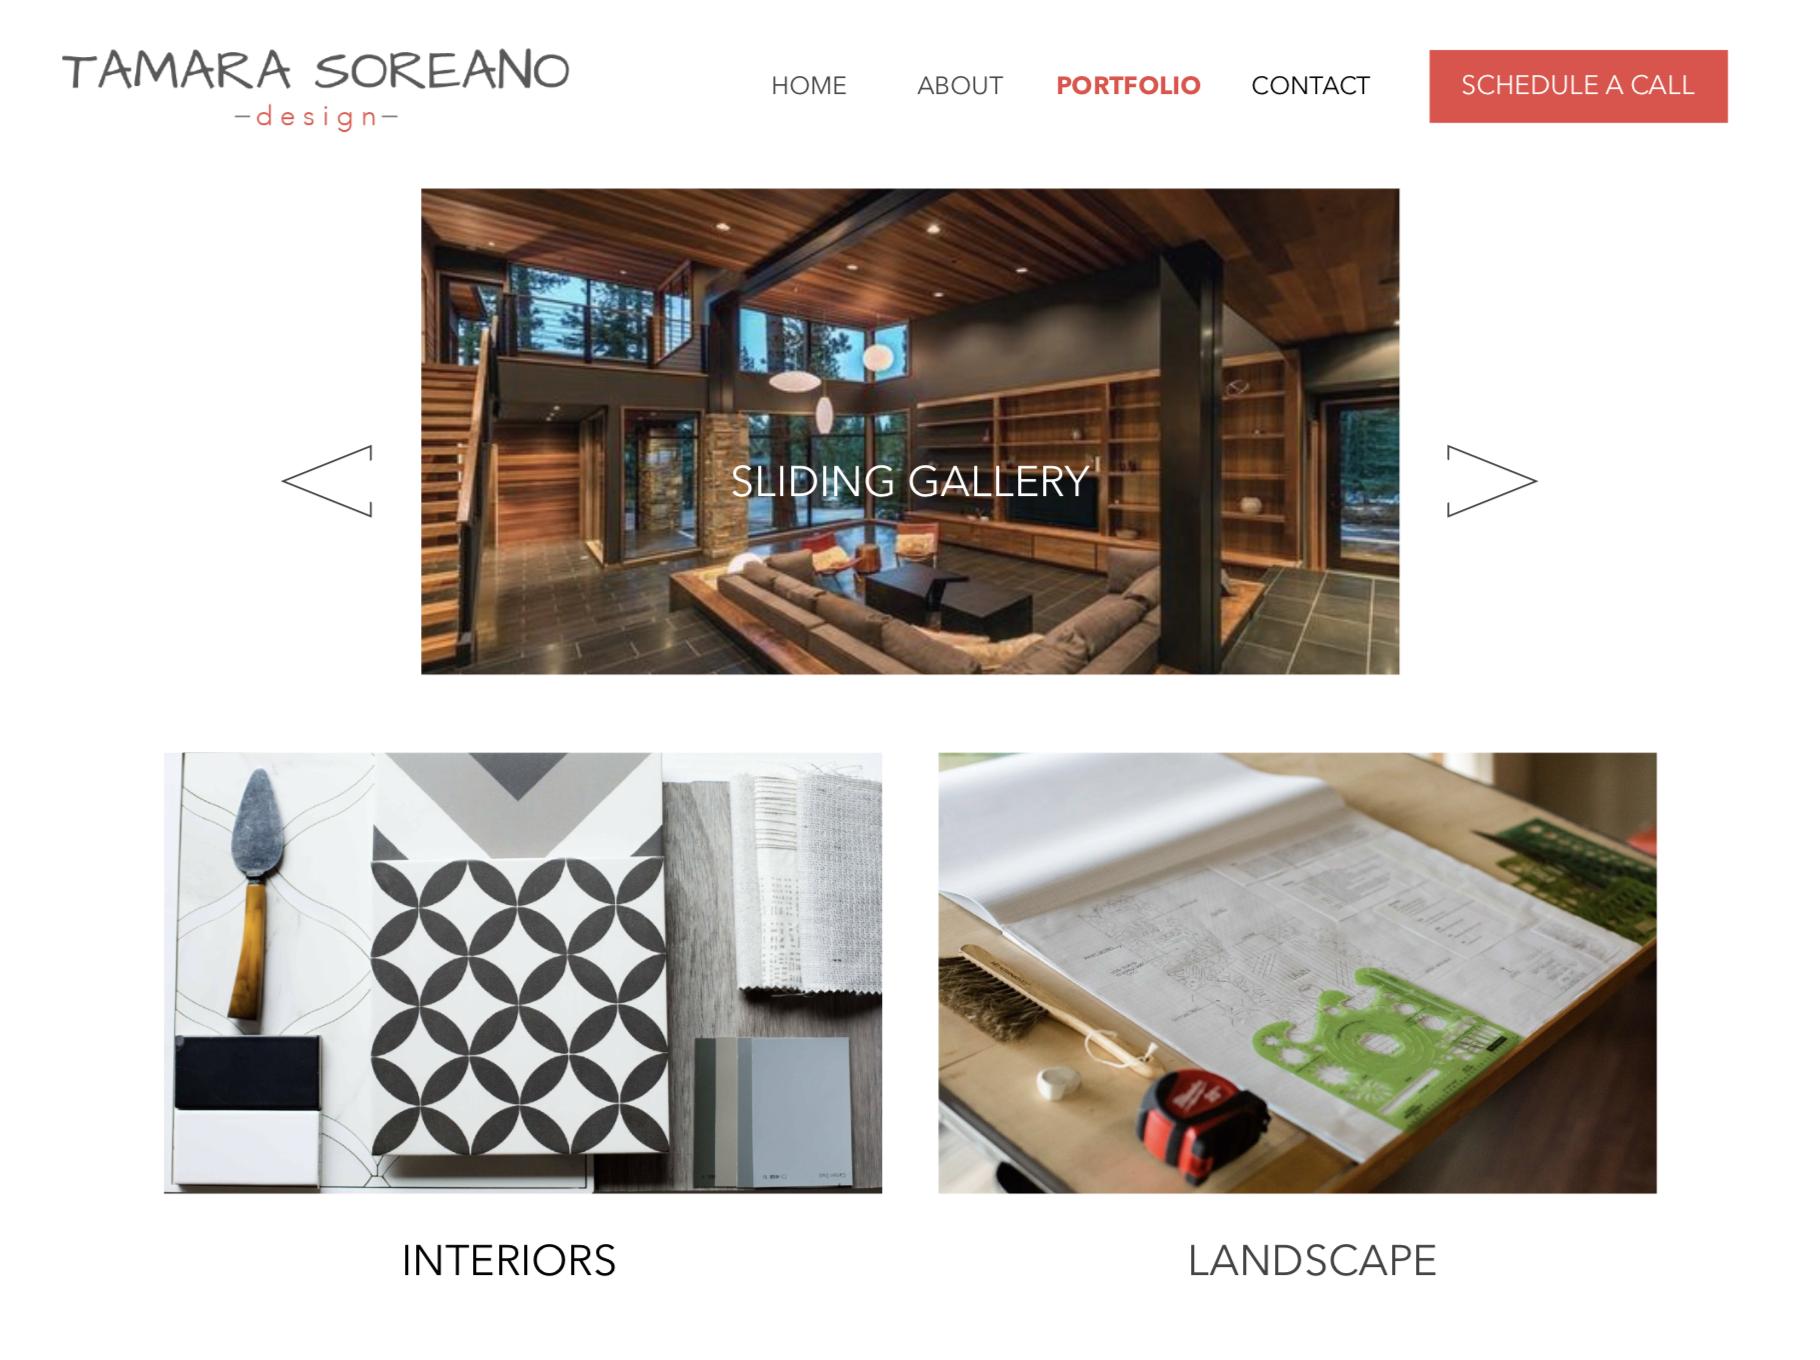 Tamara Soreano Design Portfolio Page